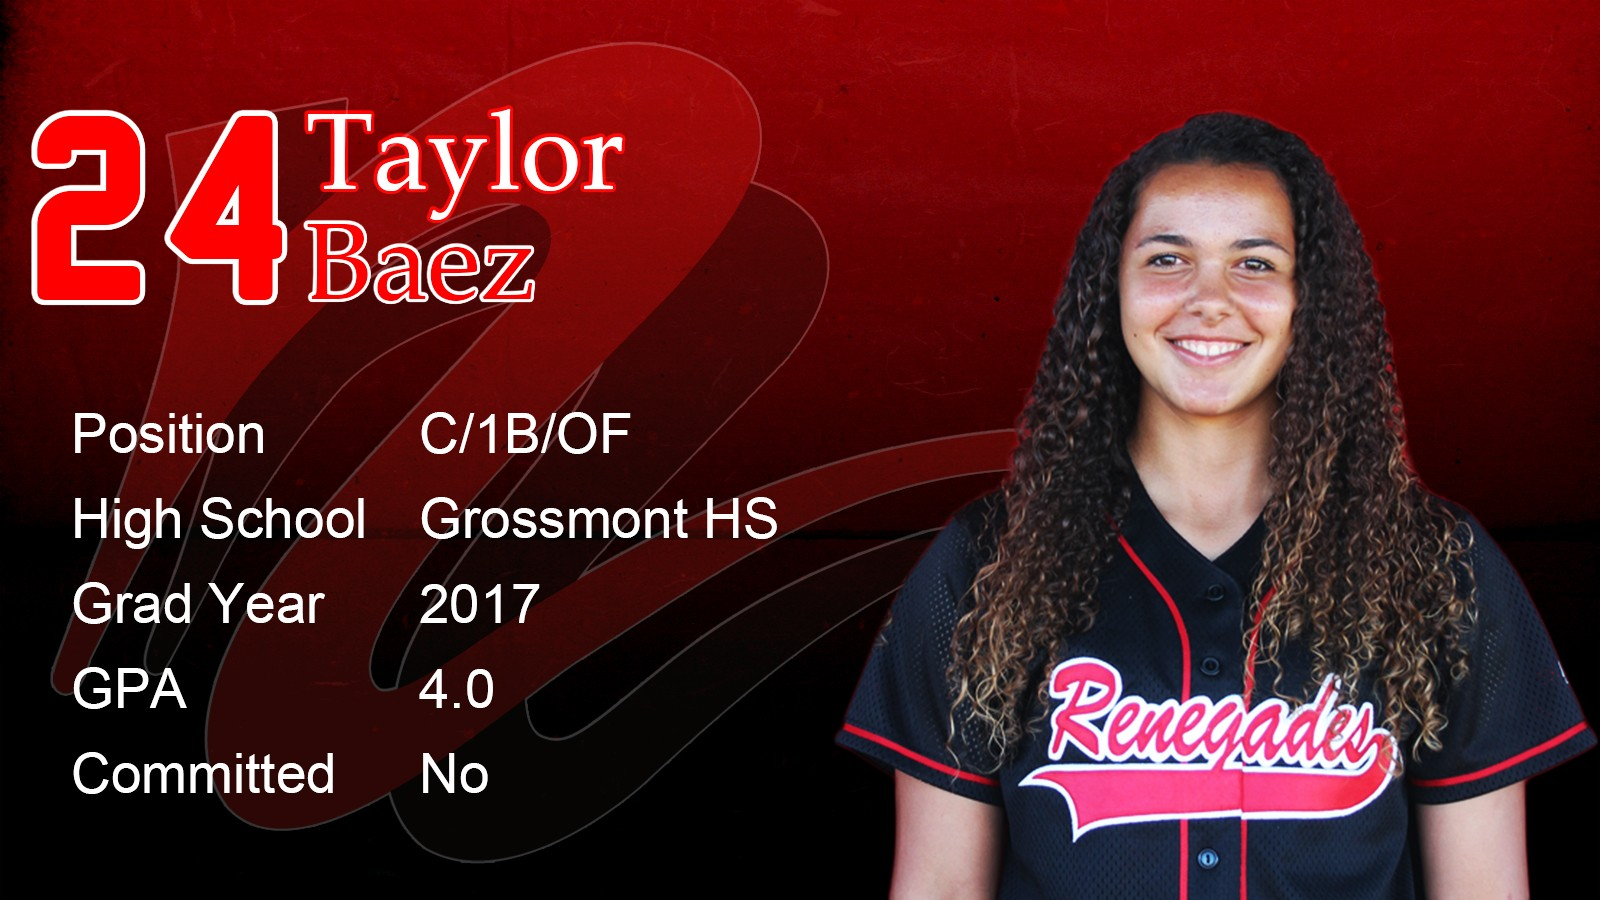 Taylor-Baez